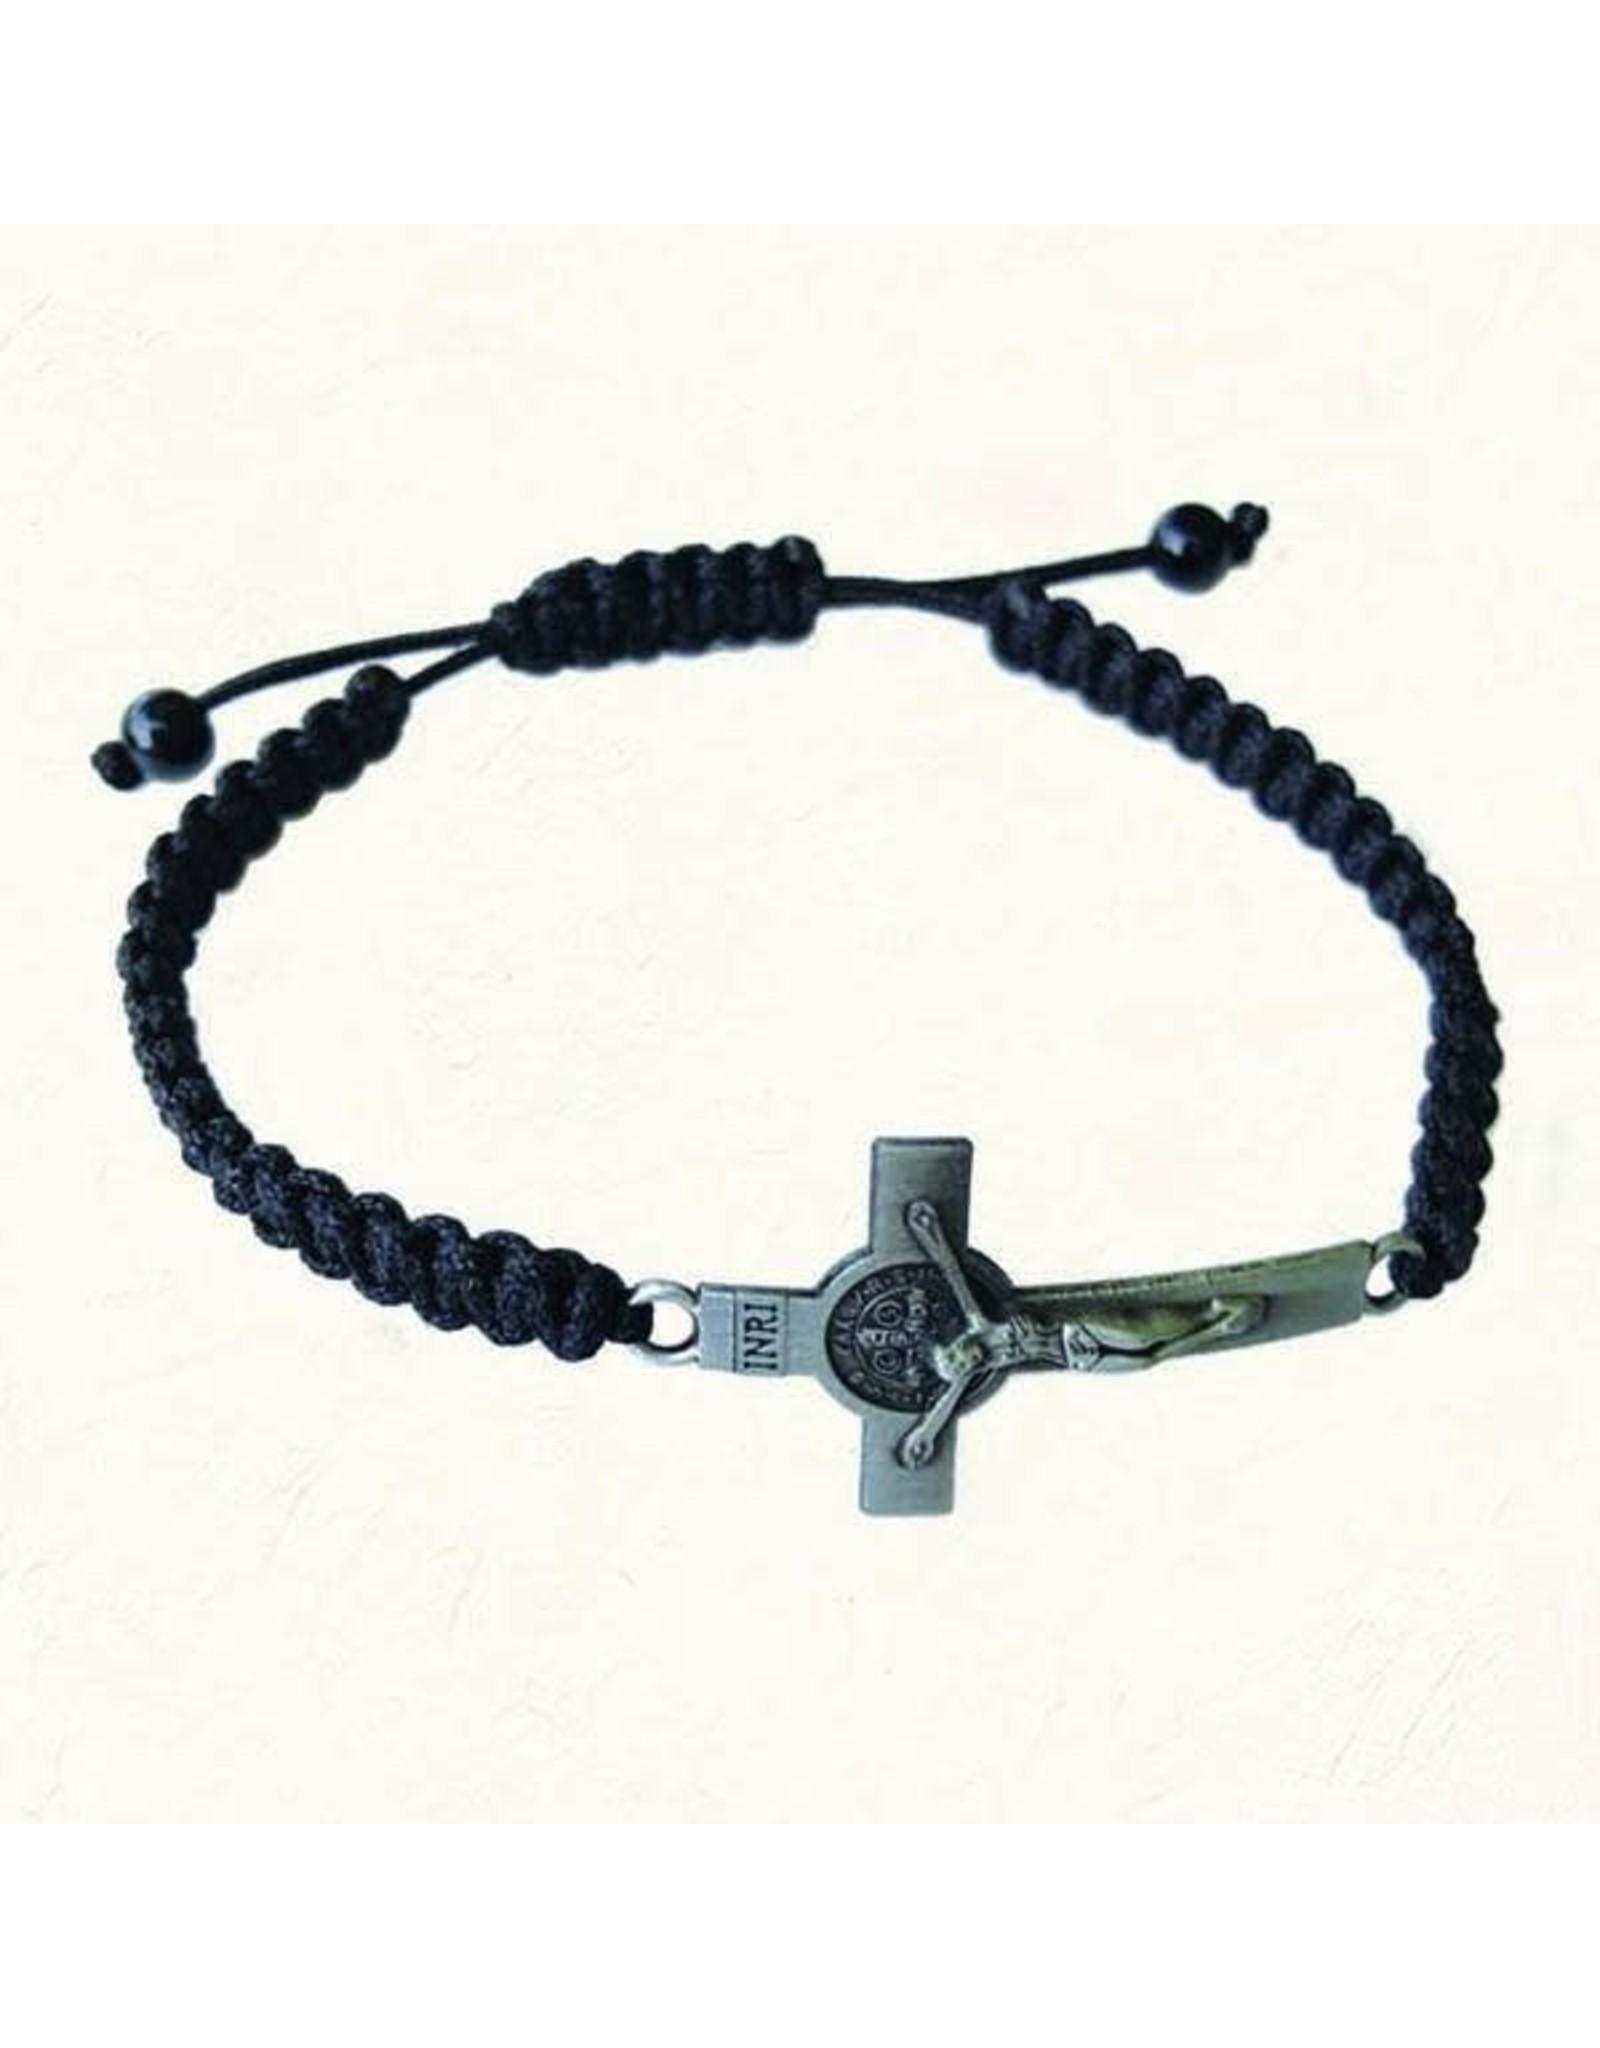 Black Slip Knot Bracelet with Antique Silver-Tone St. Benedict Cross